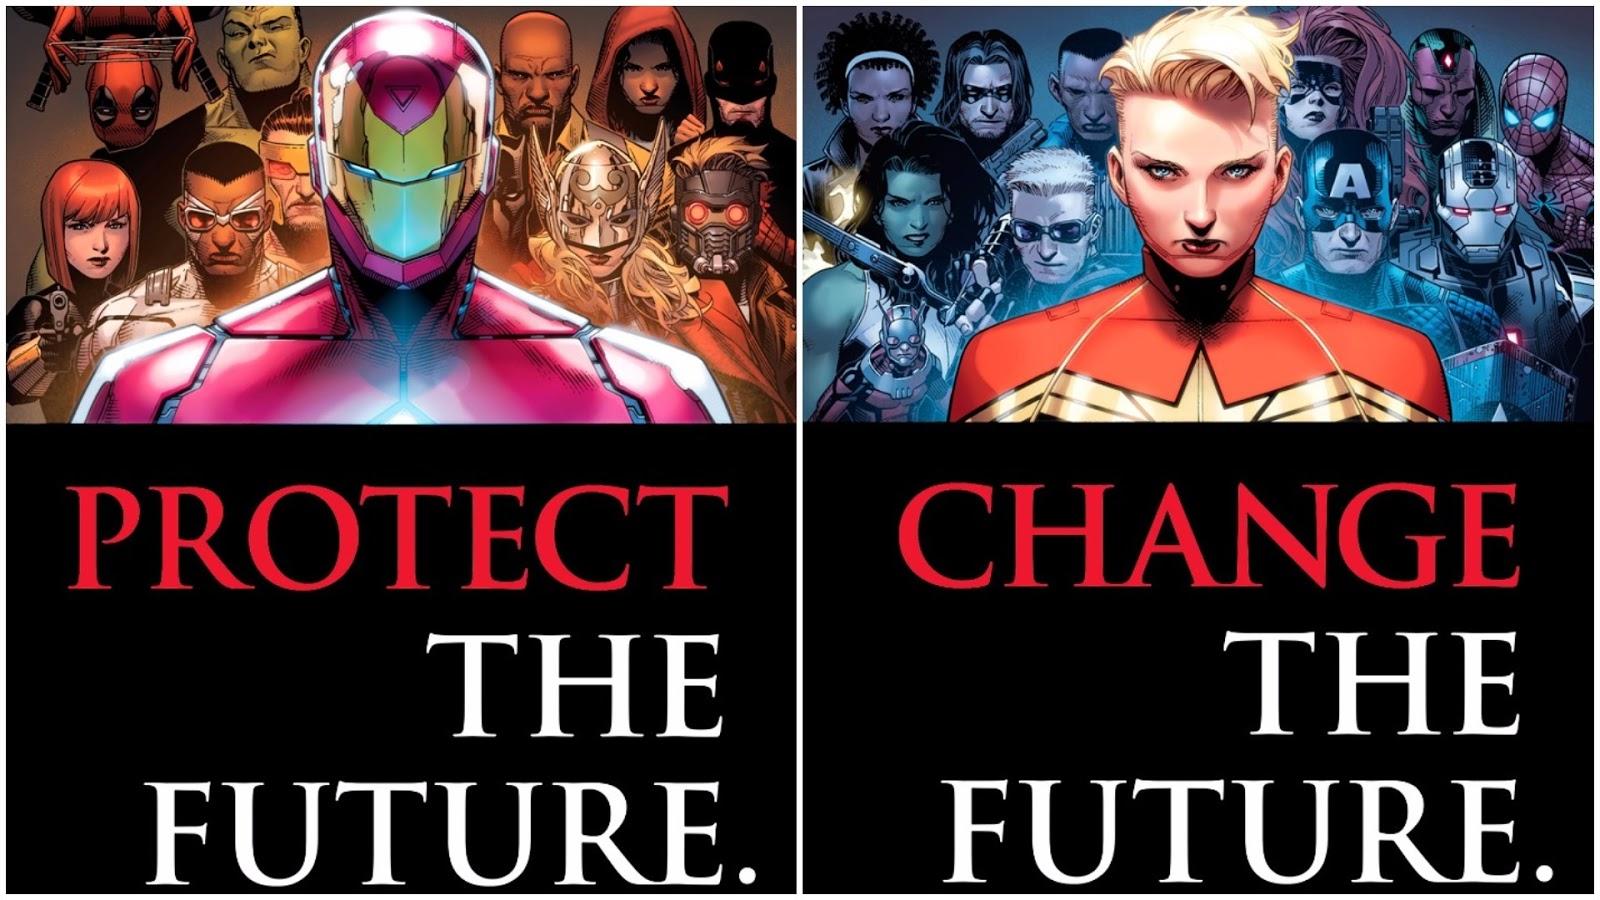 marvel civil war 2: iron man vs captain marvel